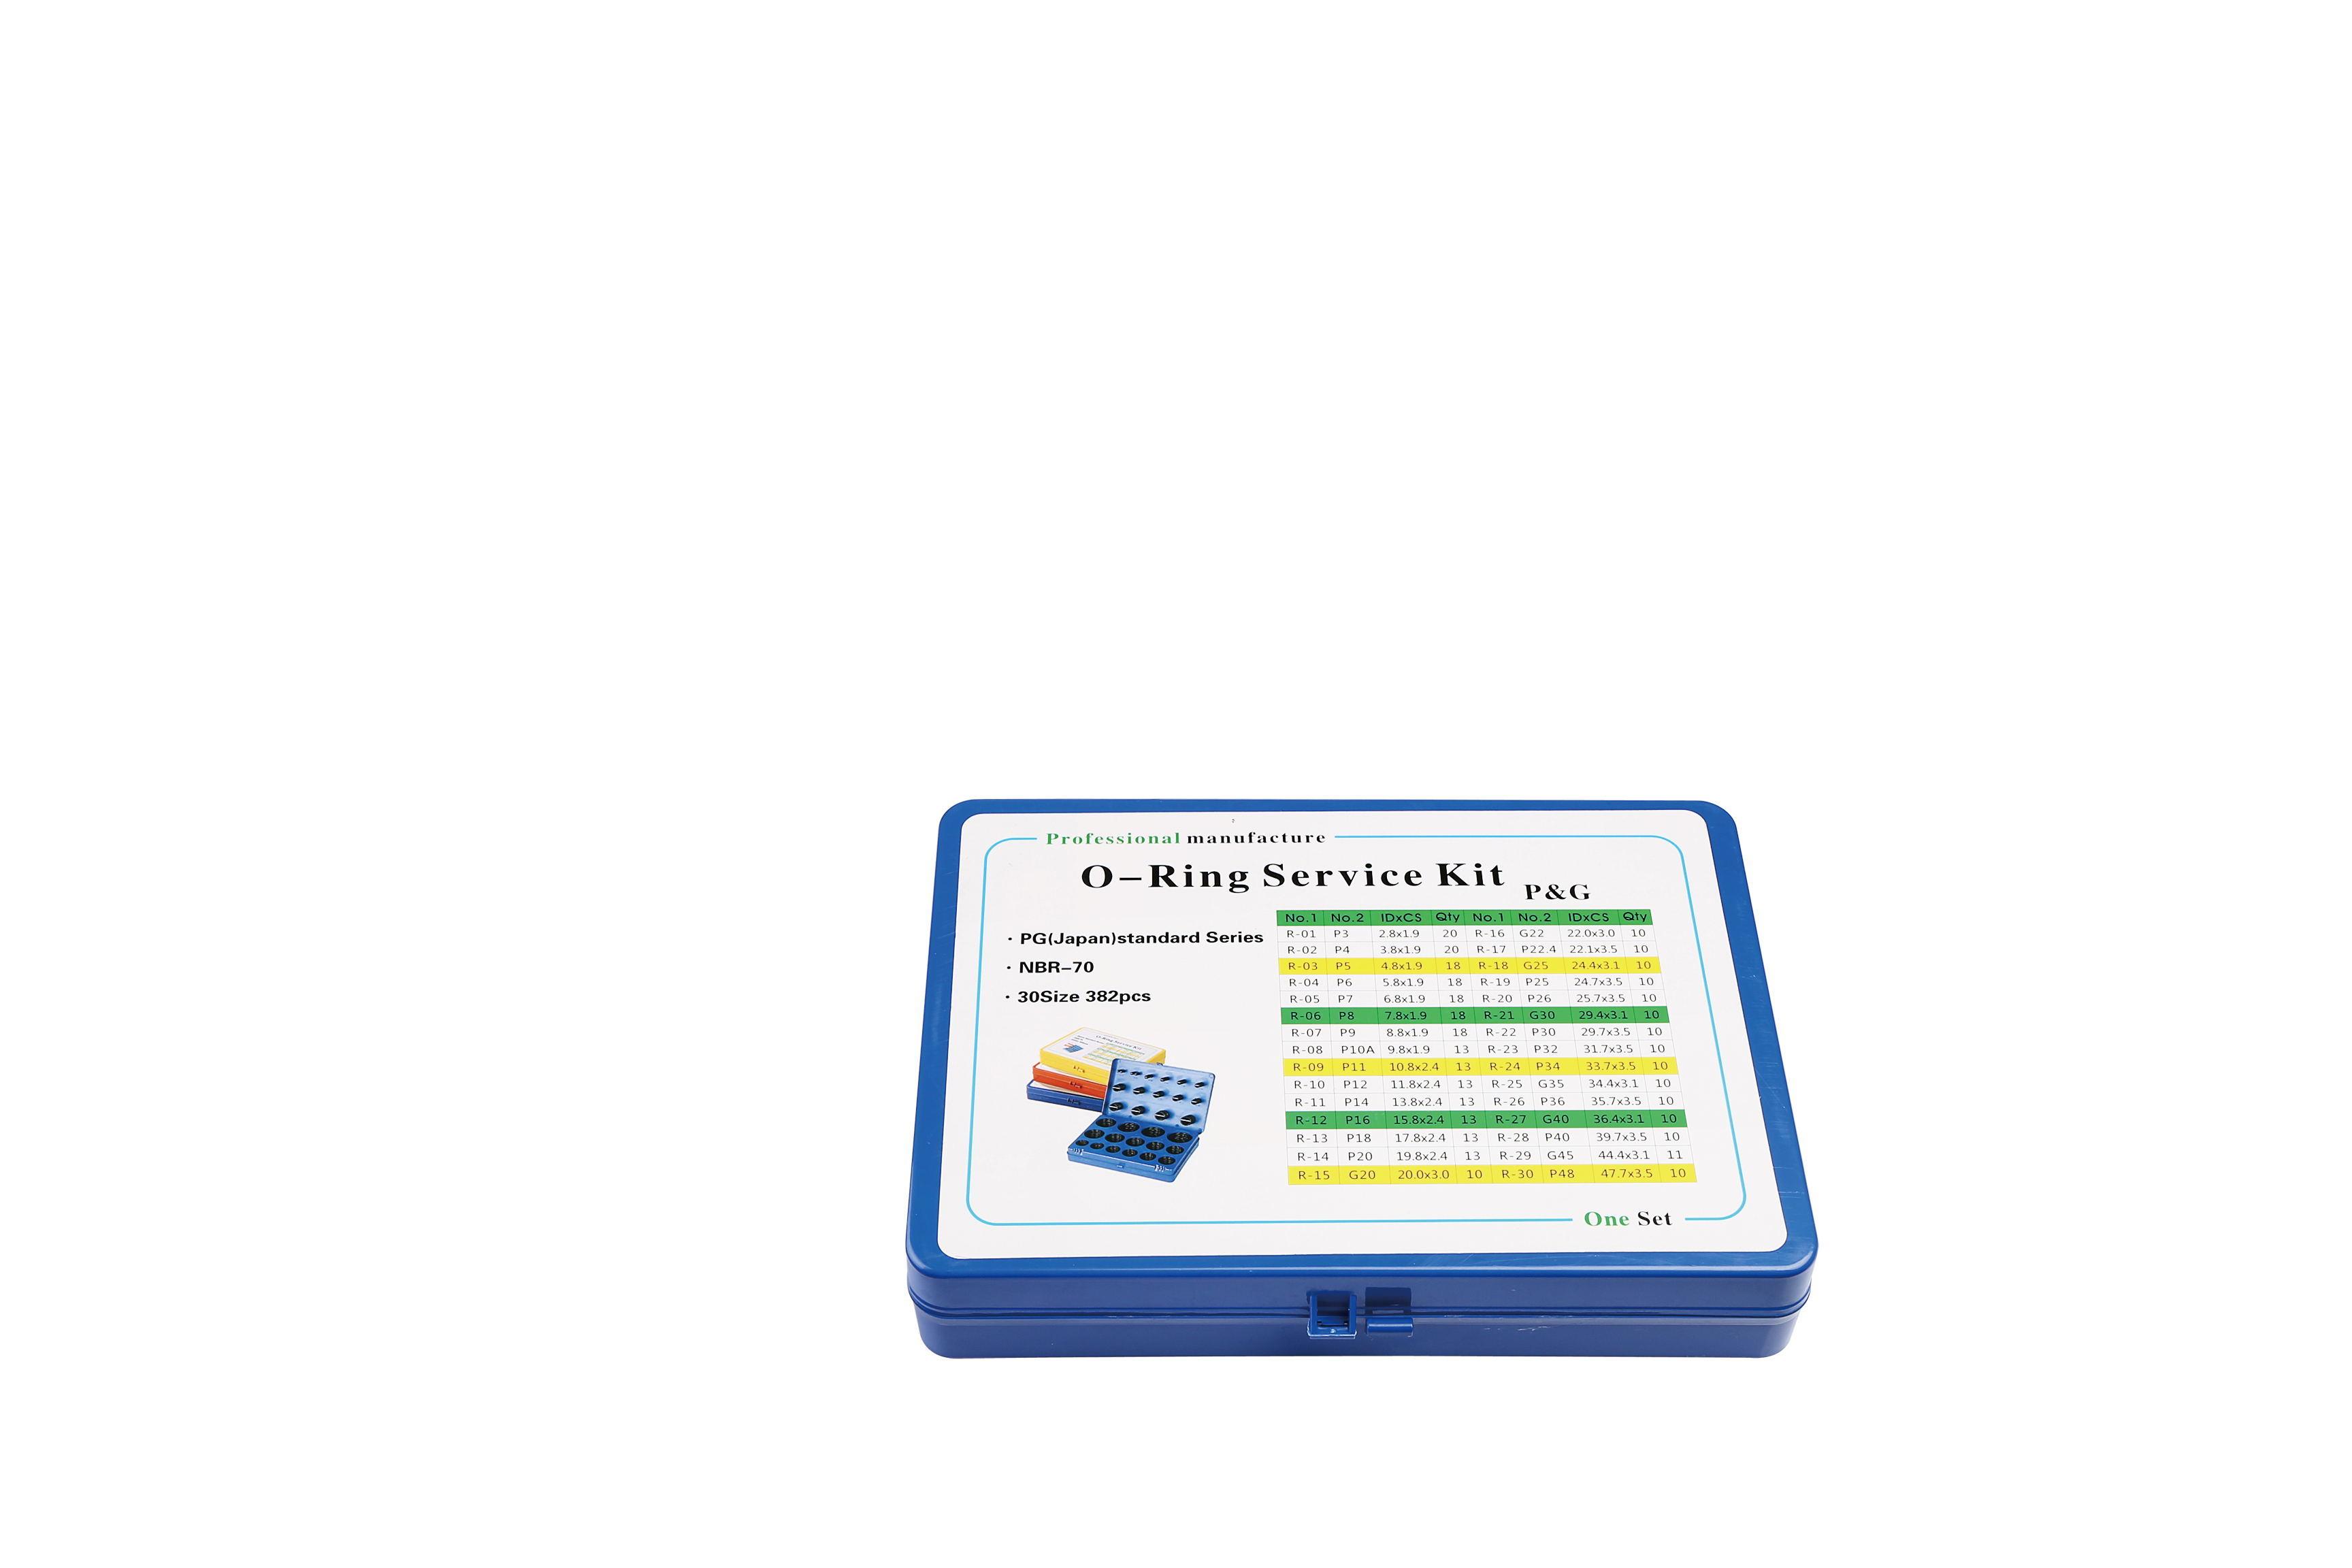 9 Pieces Black Buna-N O-Ring Splicing Kit 70A Durometer Metric Sizes 1 Meter Each